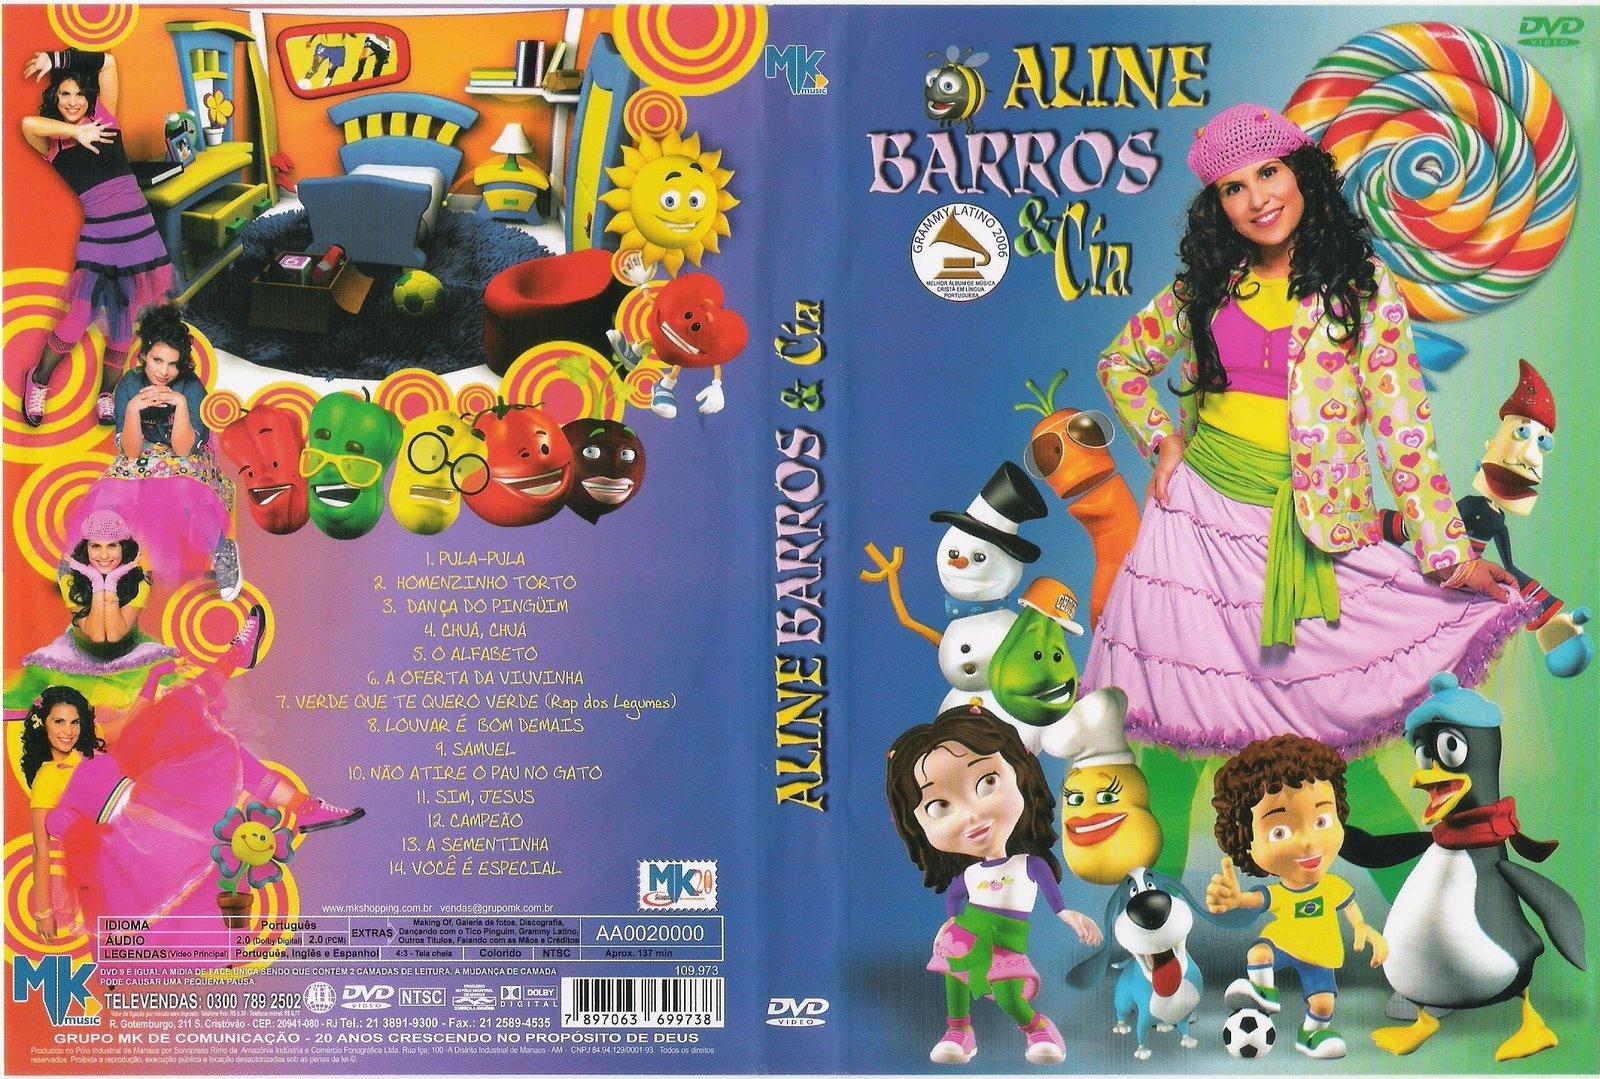 dvd aline barros e cia 2 dvdrip avi